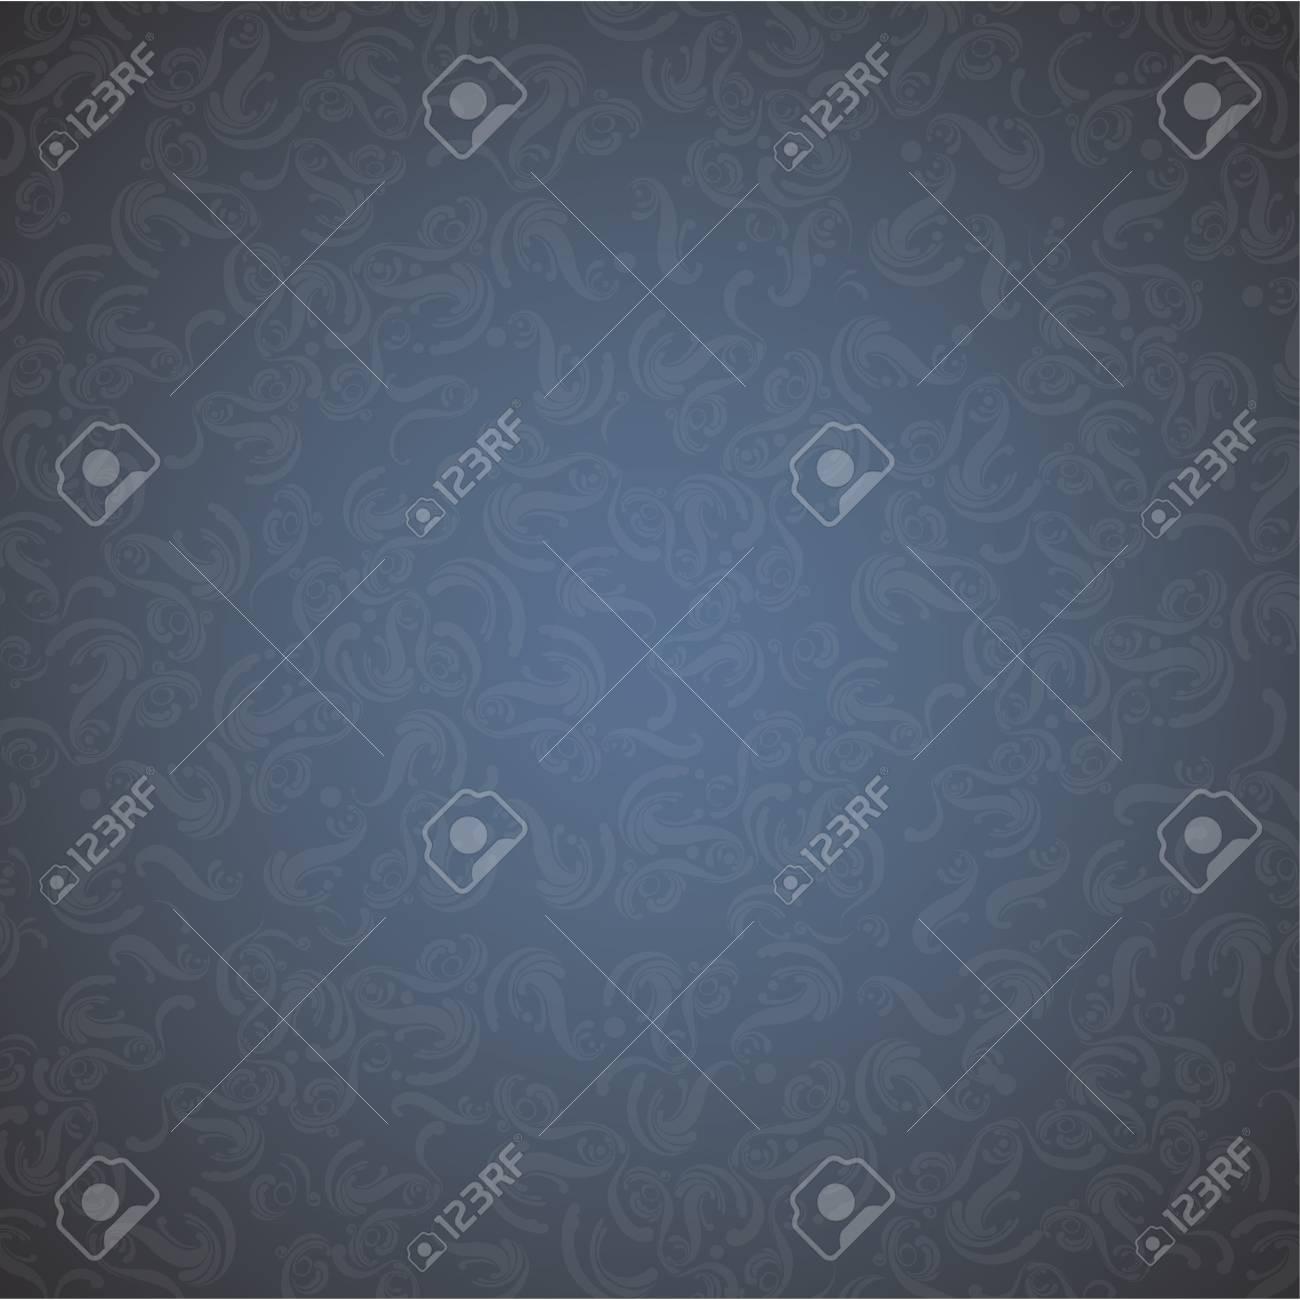 Vintage background. Vector design. Stock Vector - 16932486